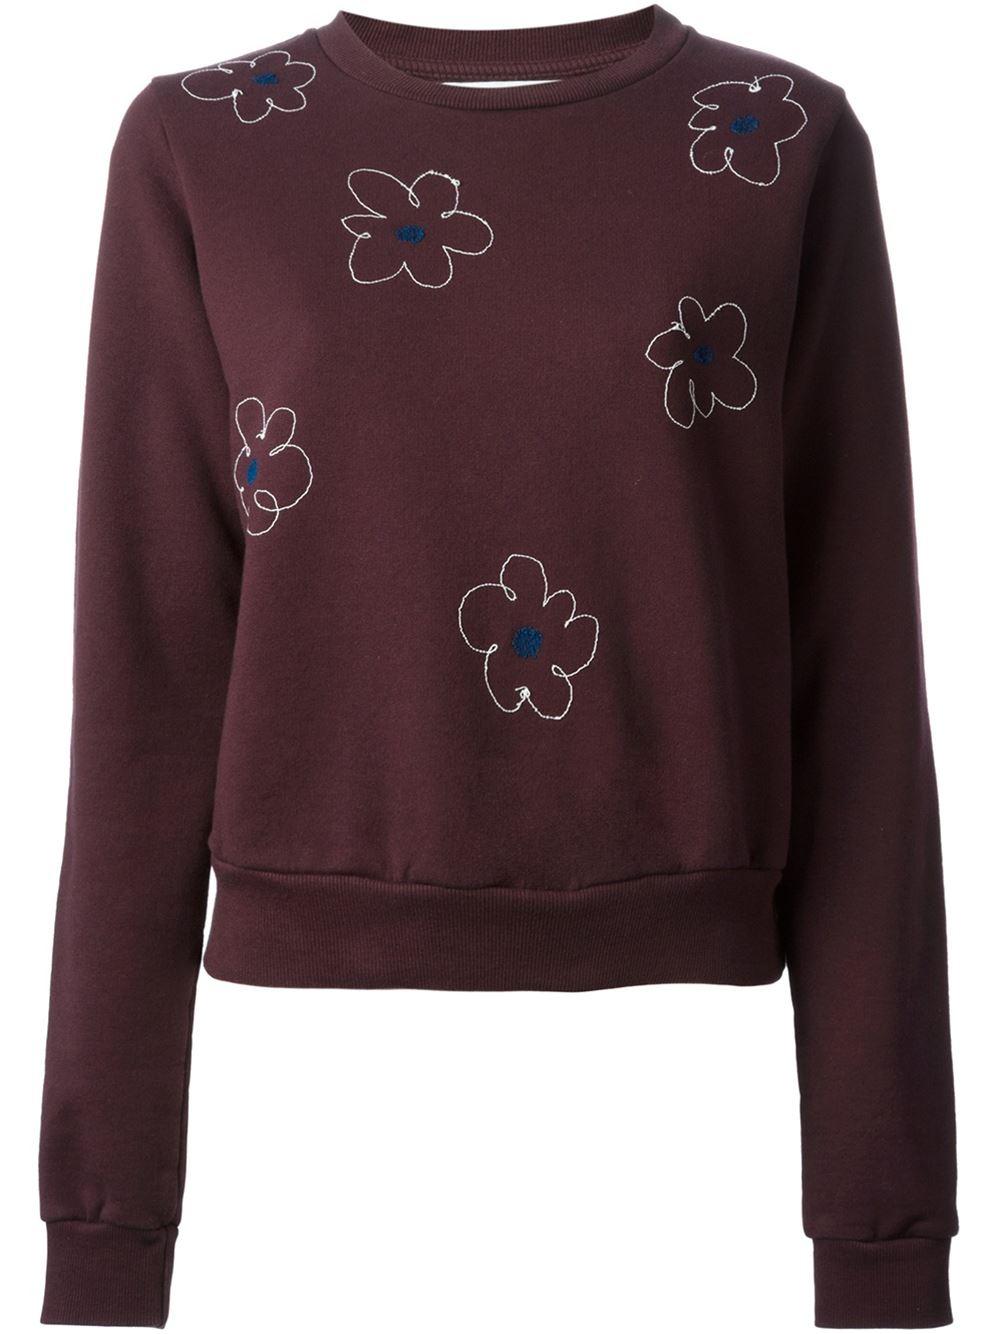 Jimi roos floral embroidered sweatshirt in purple pink